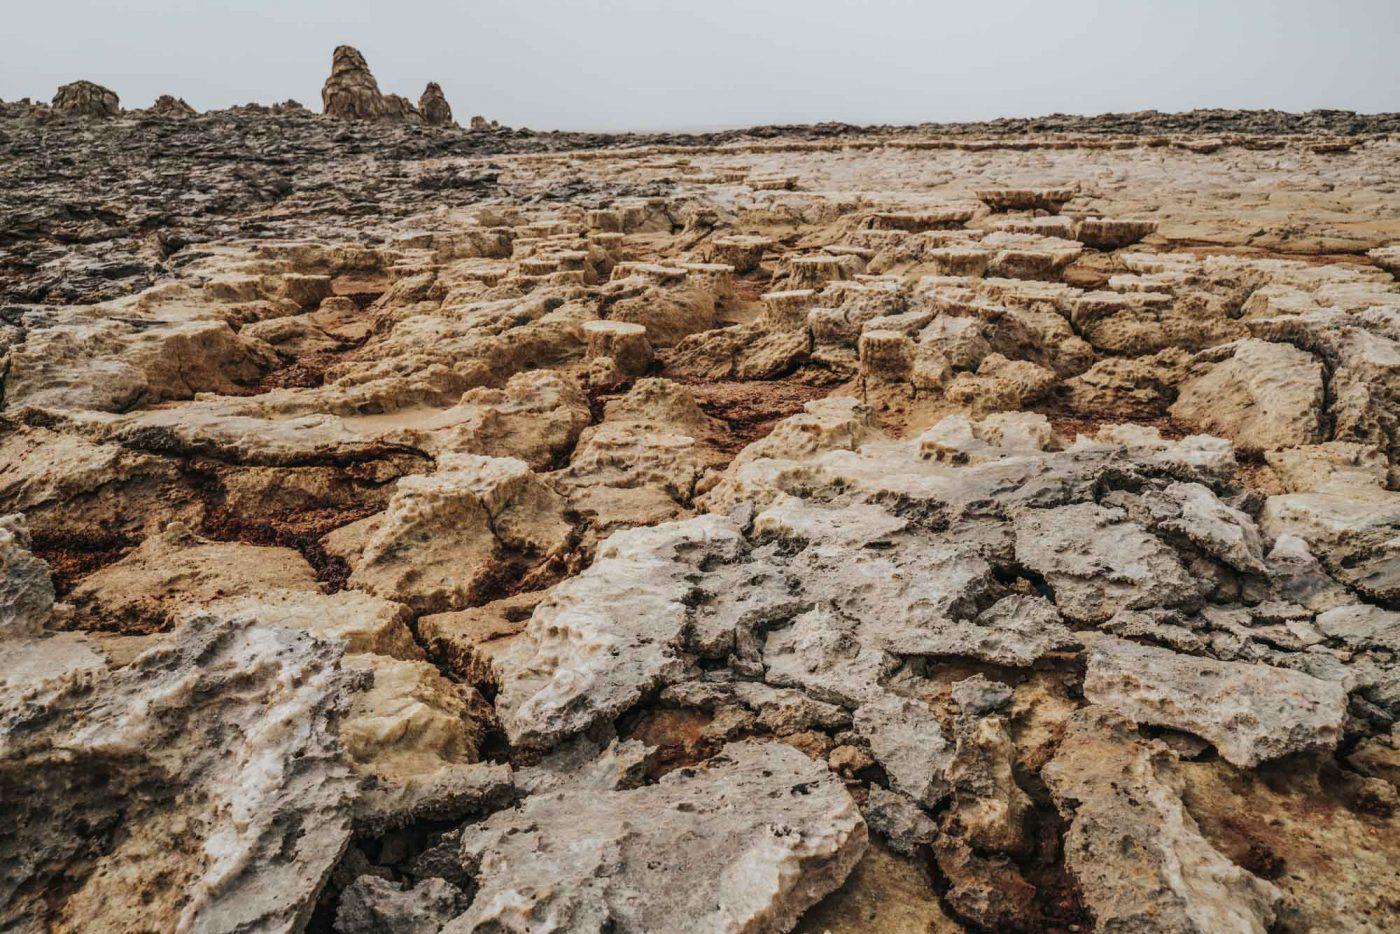 Day trip to the Danakil Depression, Northern Ethiopia